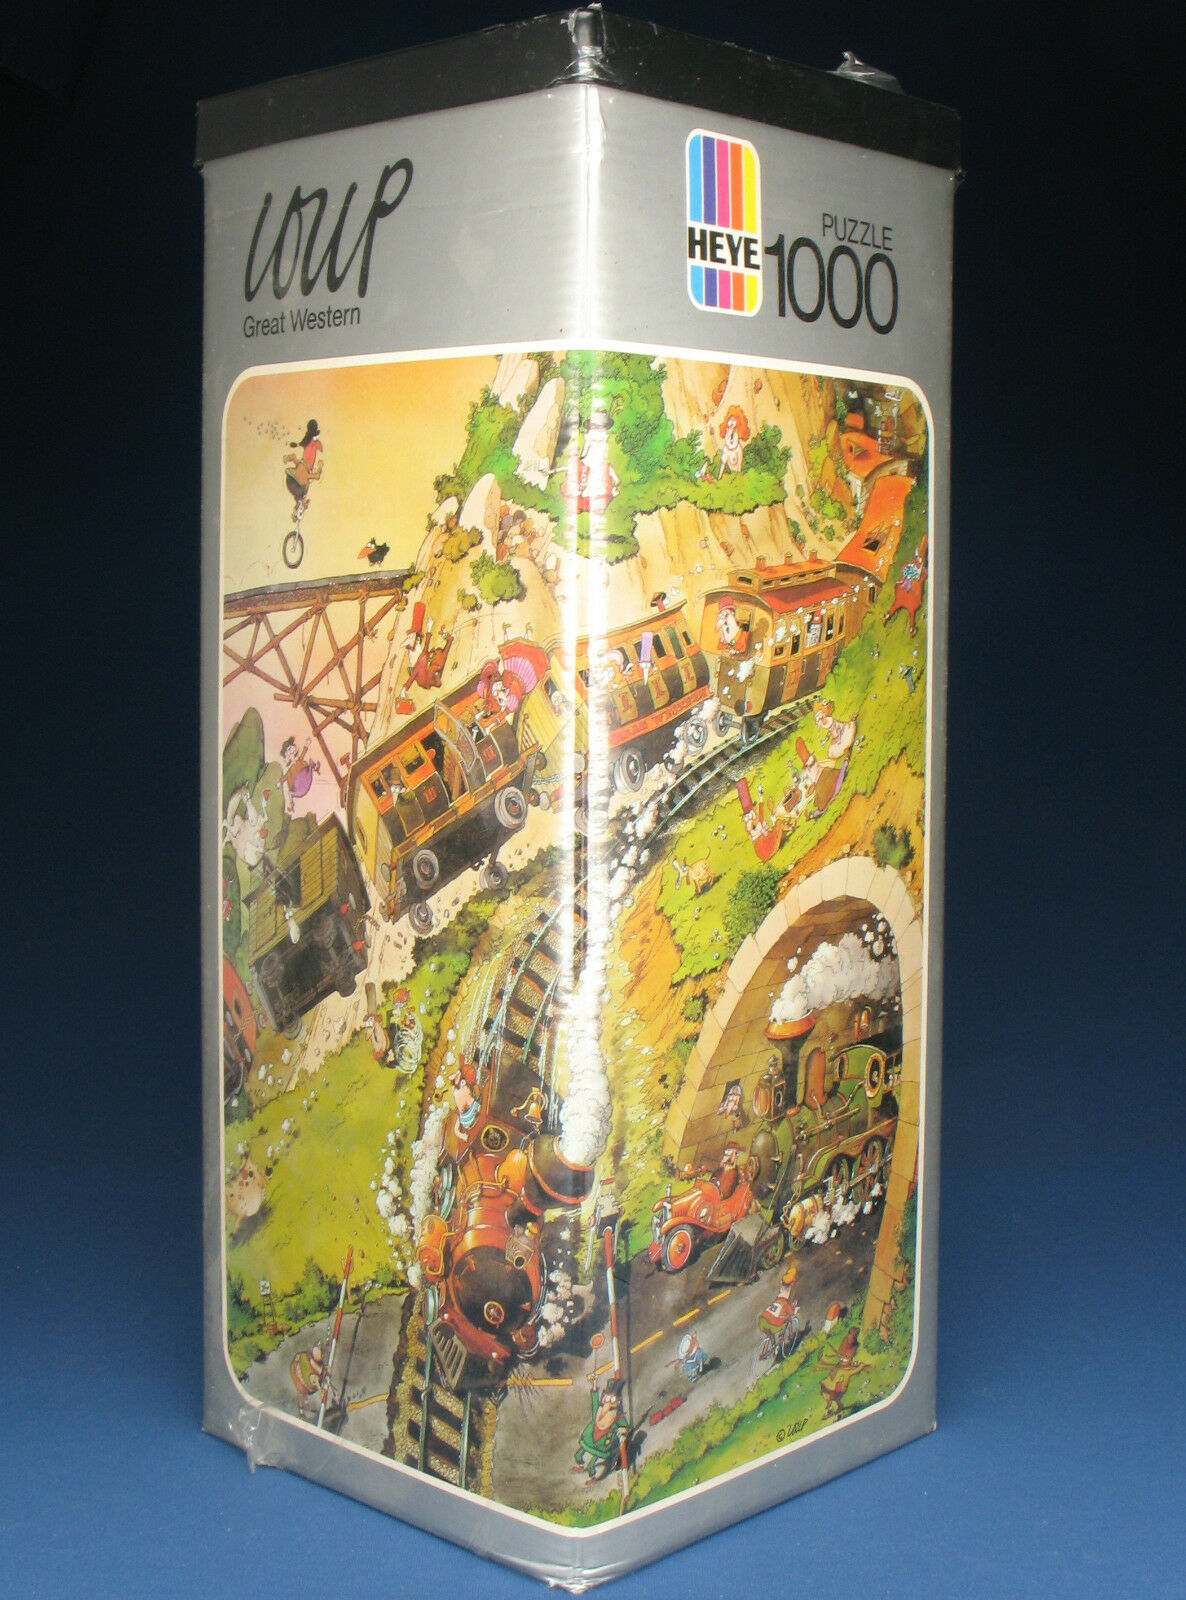 HEYE PUZZLE TRIANGOLARE 8708-Loup-Great Western - 1974 - 1000 PEZZI-NUOVO-NEW